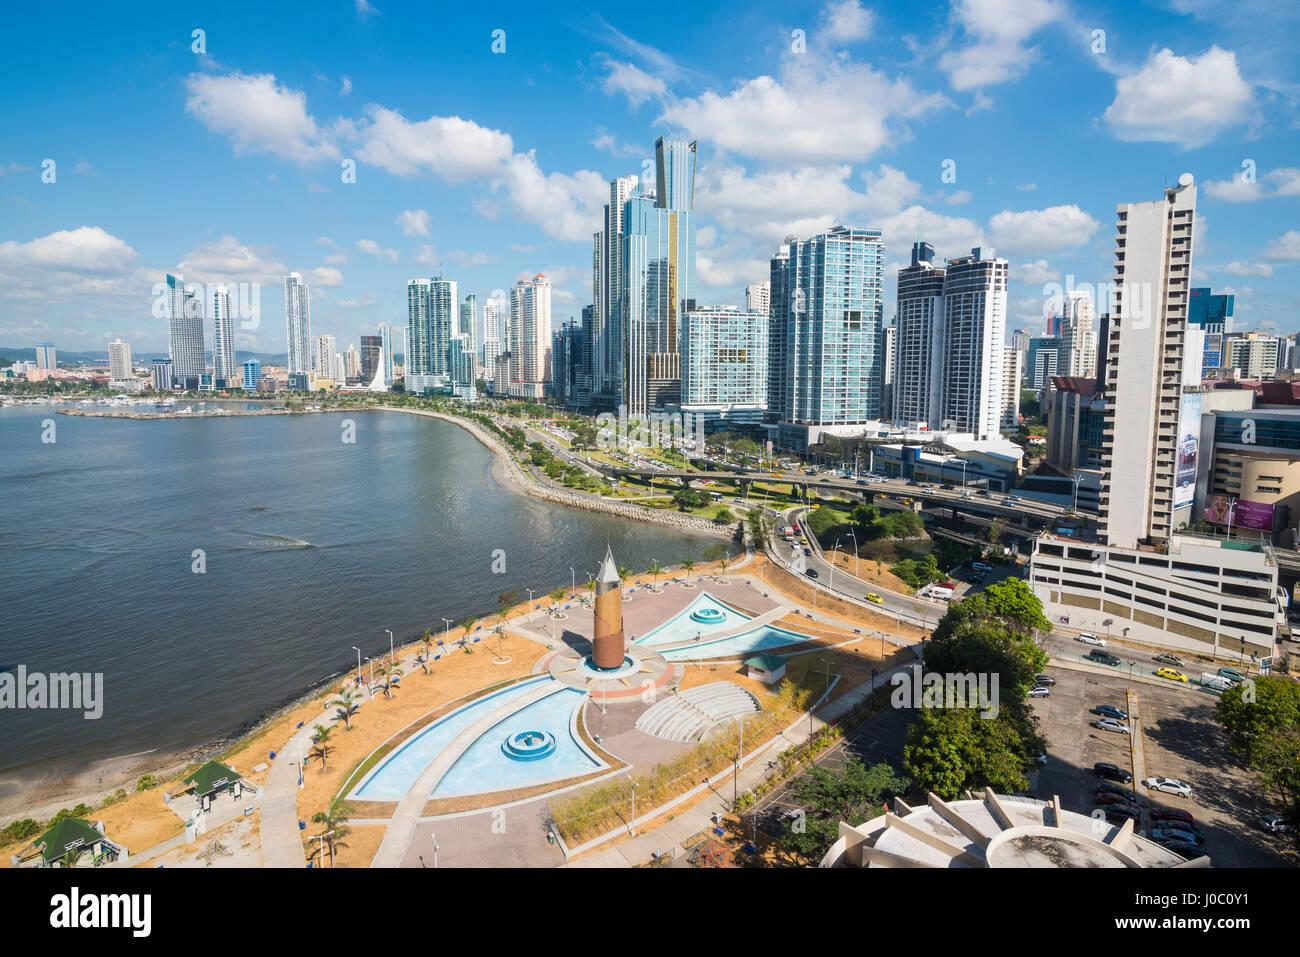 Die Skyline von Panama City, Panama, Mittelamerika Stockbild